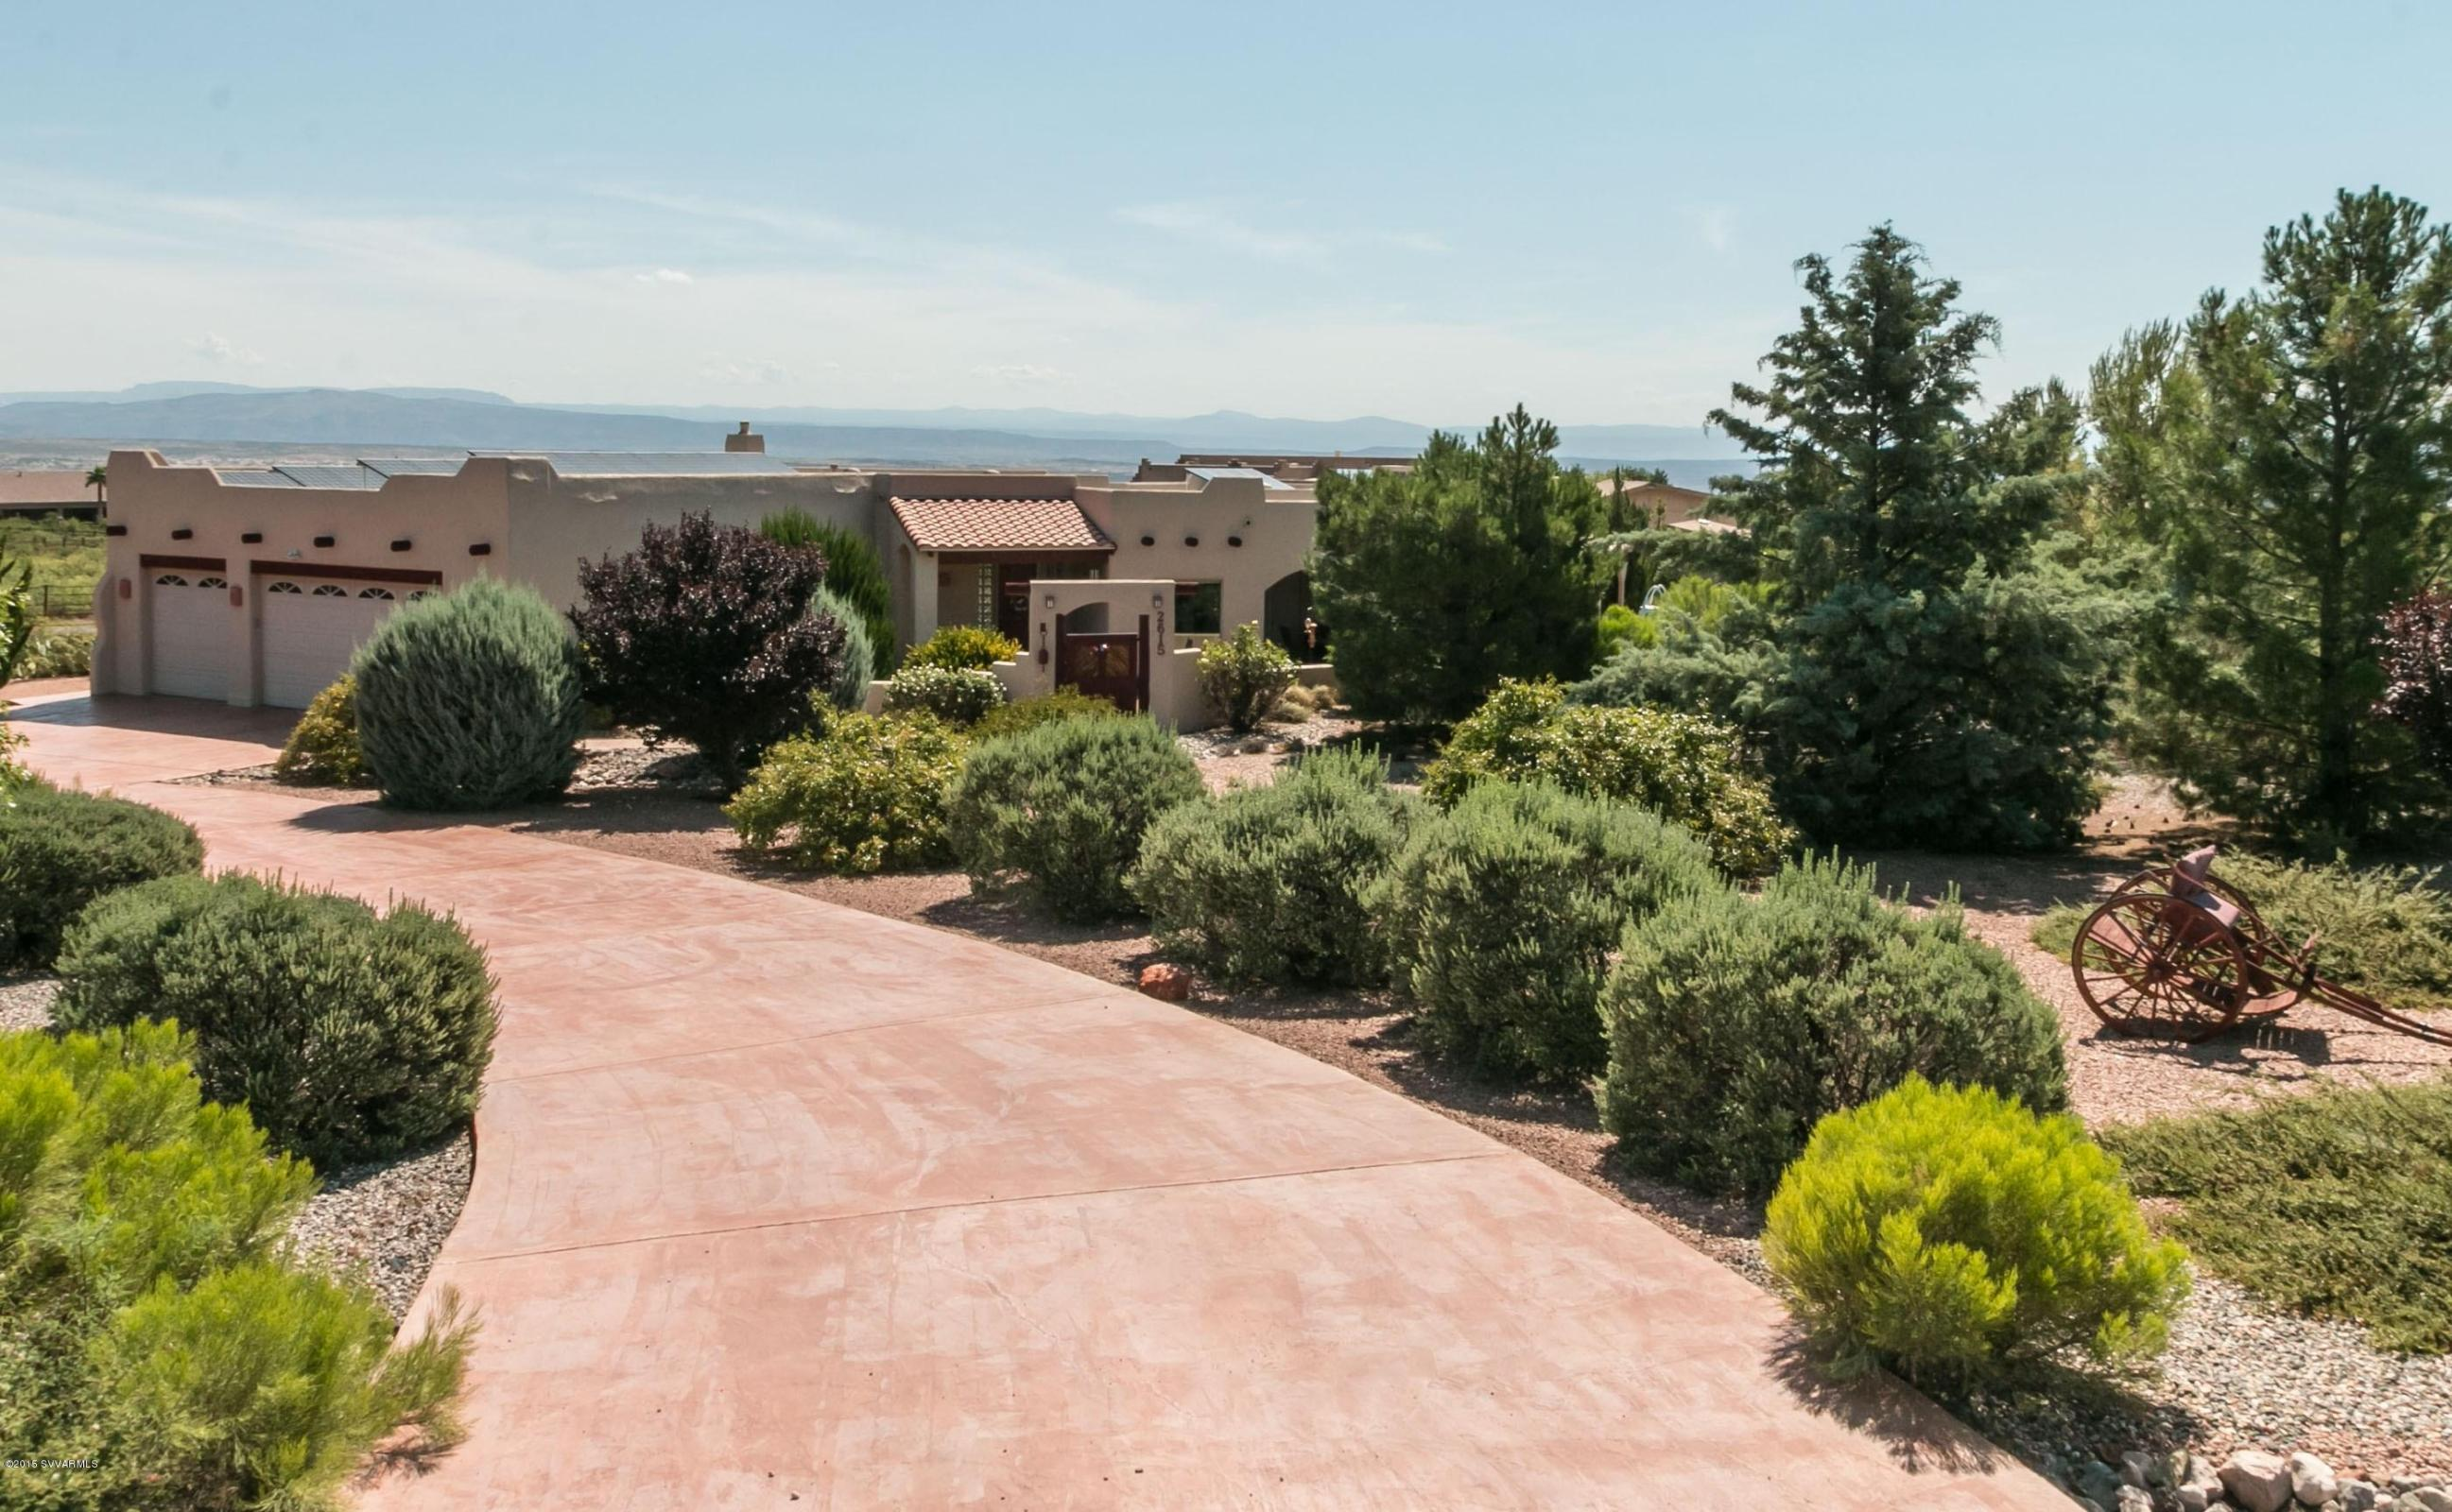 2615 S. PEAK TOP VIEW, Cottonwood, Arizona 86326